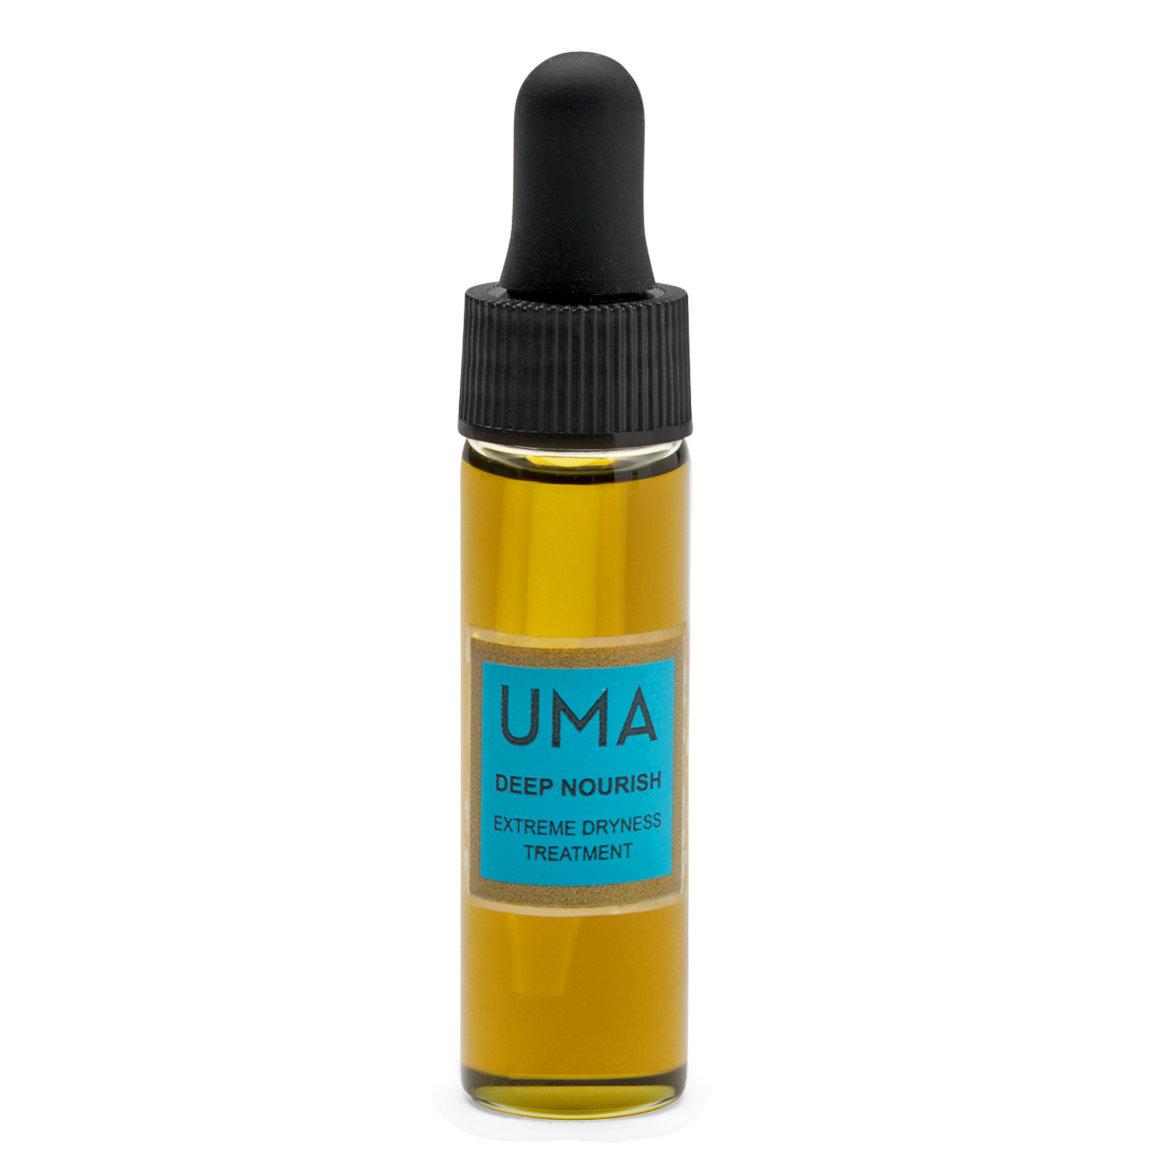 Uma Deep Nourish Extreme Dryness Treatment alternative view 1 - product swatch.